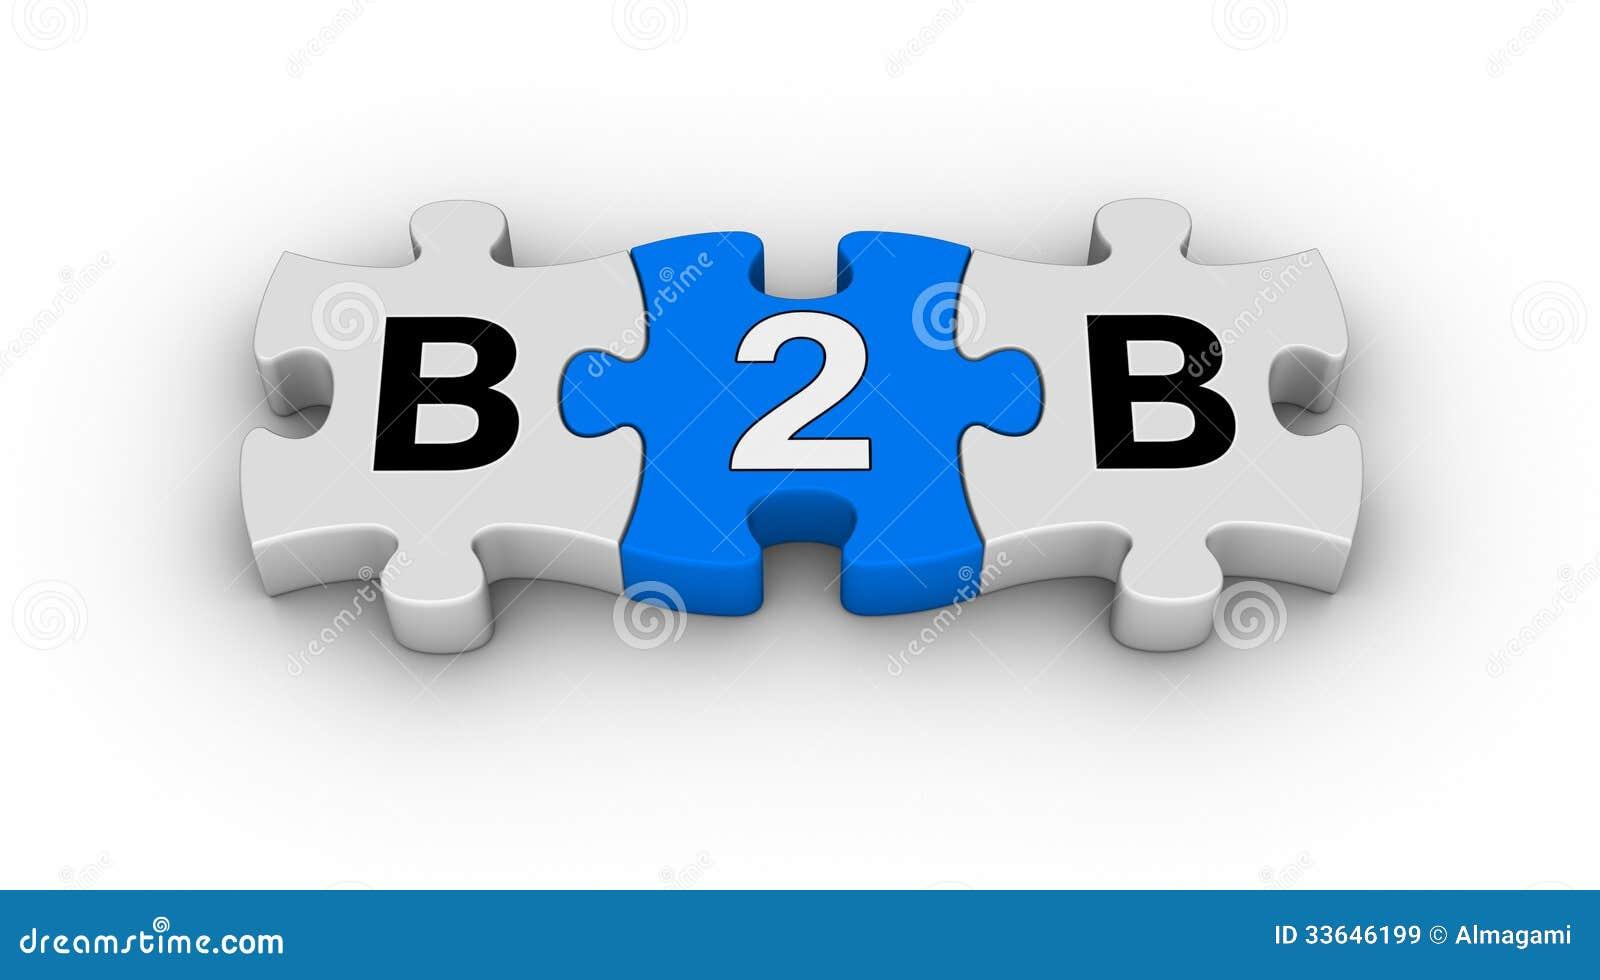 b2b royalty free stock images image 33646199